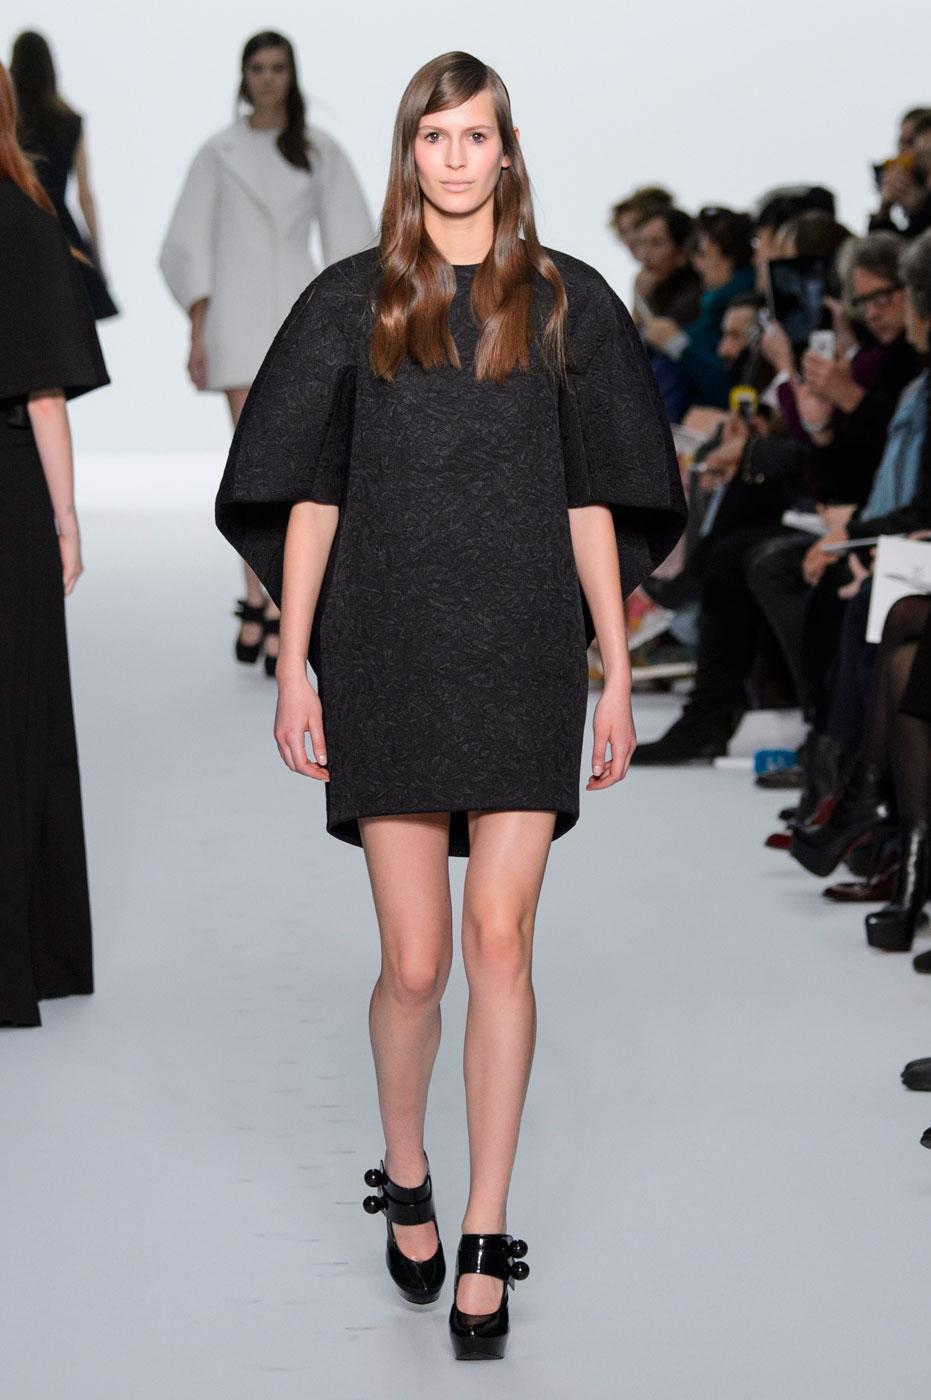 Kayek-fashion-runway-show-haute-couture-paris-spring-summer-2015-the-impression-09